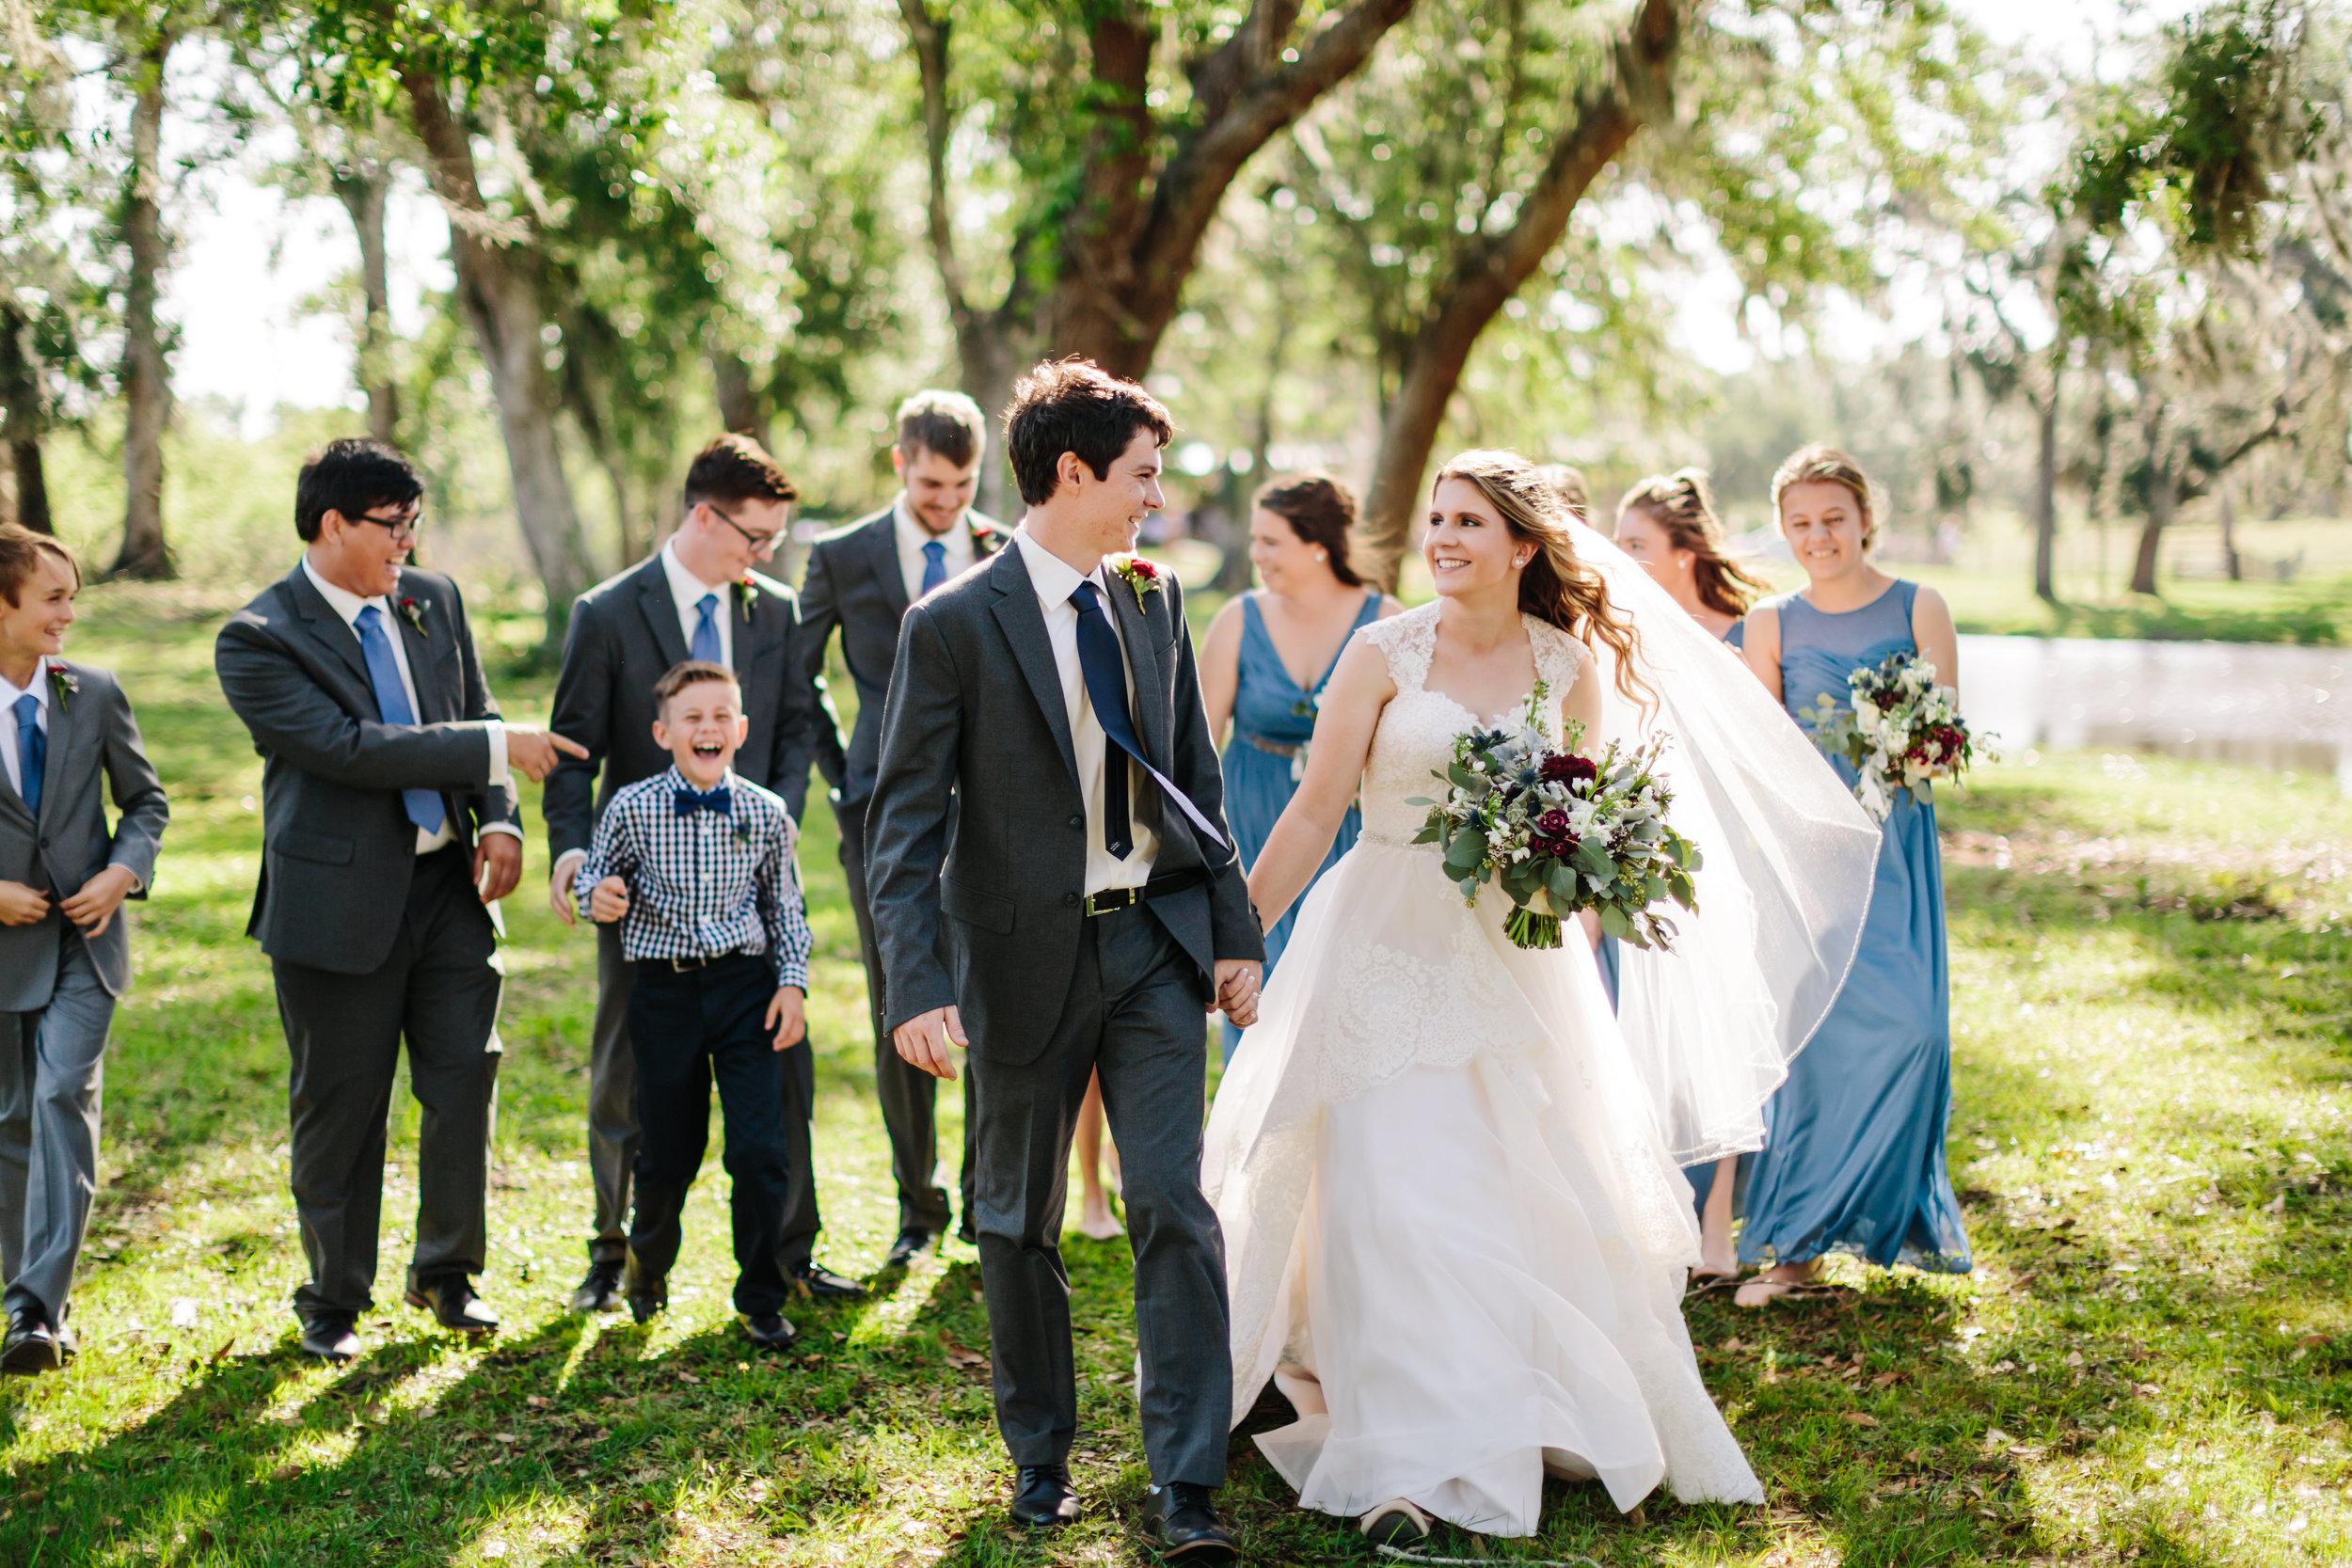 2018.04.14 Zak and Jamisyn Unrue Black Willow Barn Wedding Finals-553.jpg